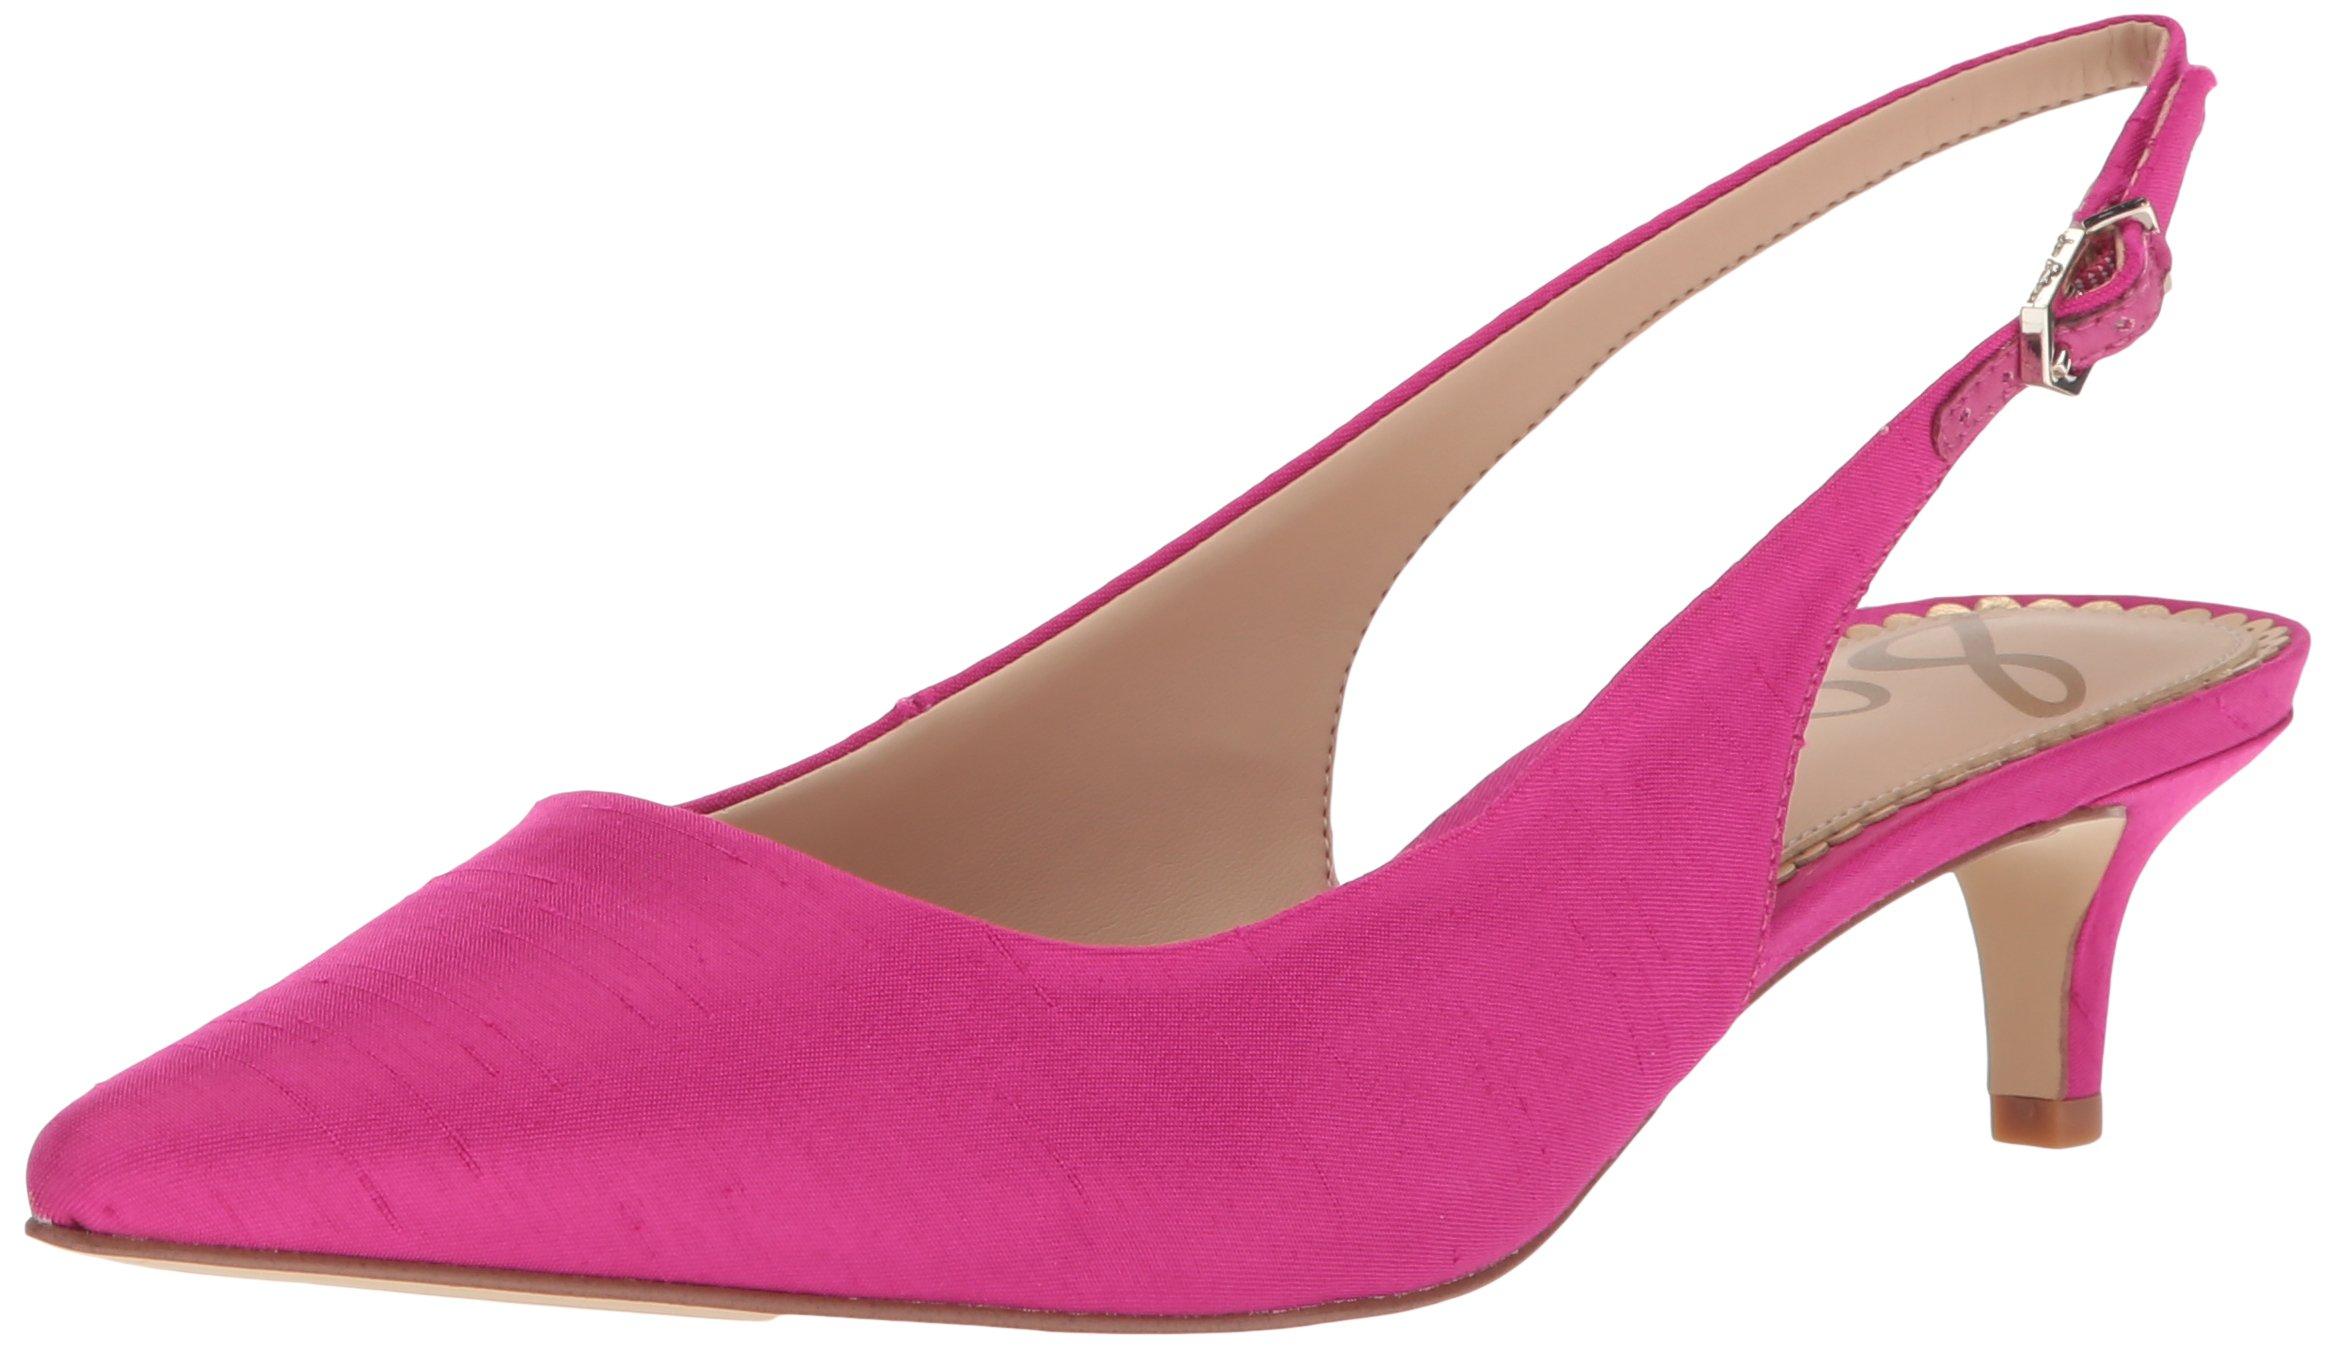 Sam Edelman Women's Ludlow Pump, Pink Magenta, 7.5 Medium US